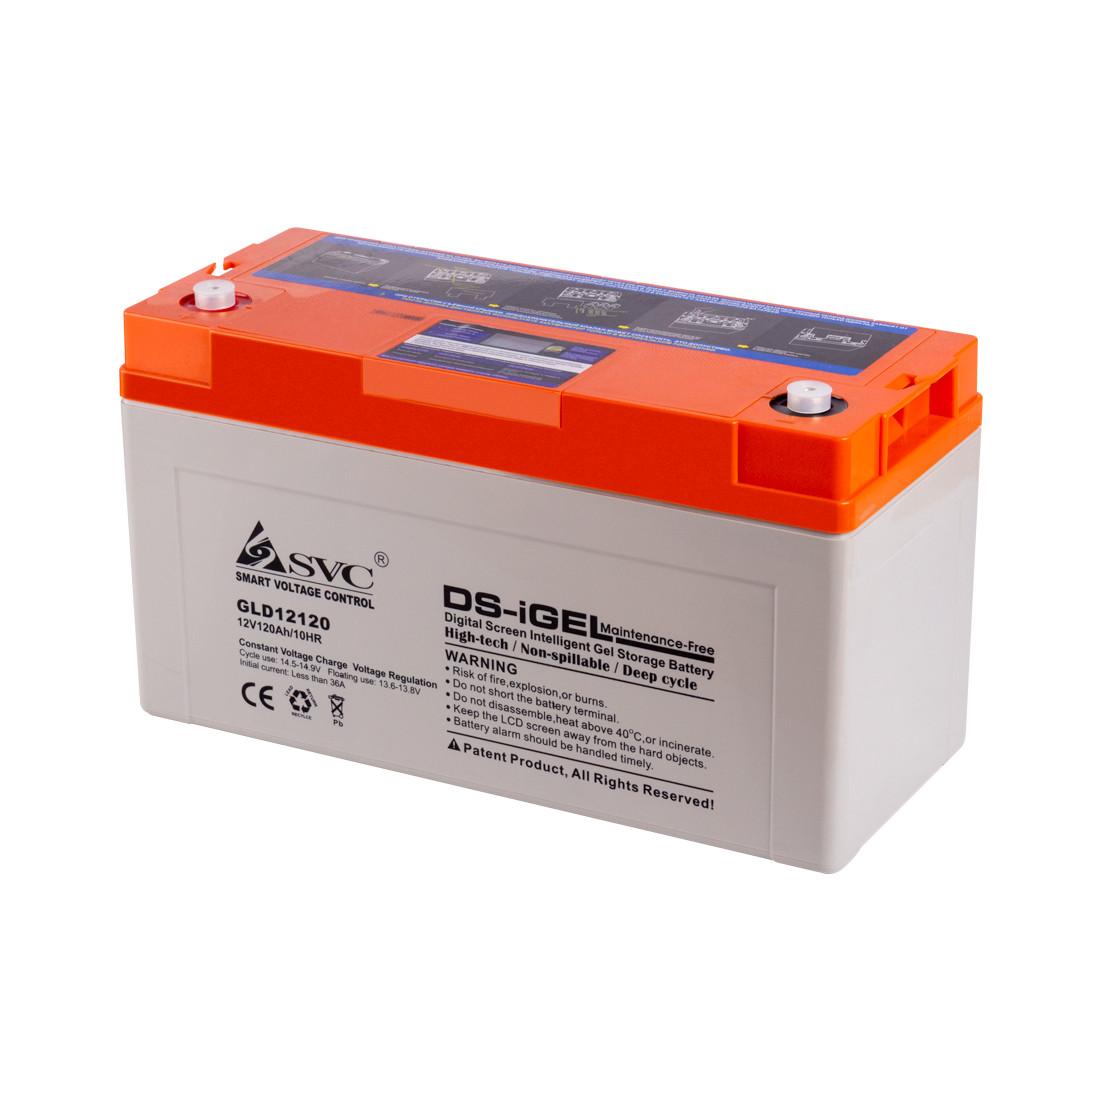 Батарея SVC GLD12120 гелевая 12В 120 Ач LED-дисплей